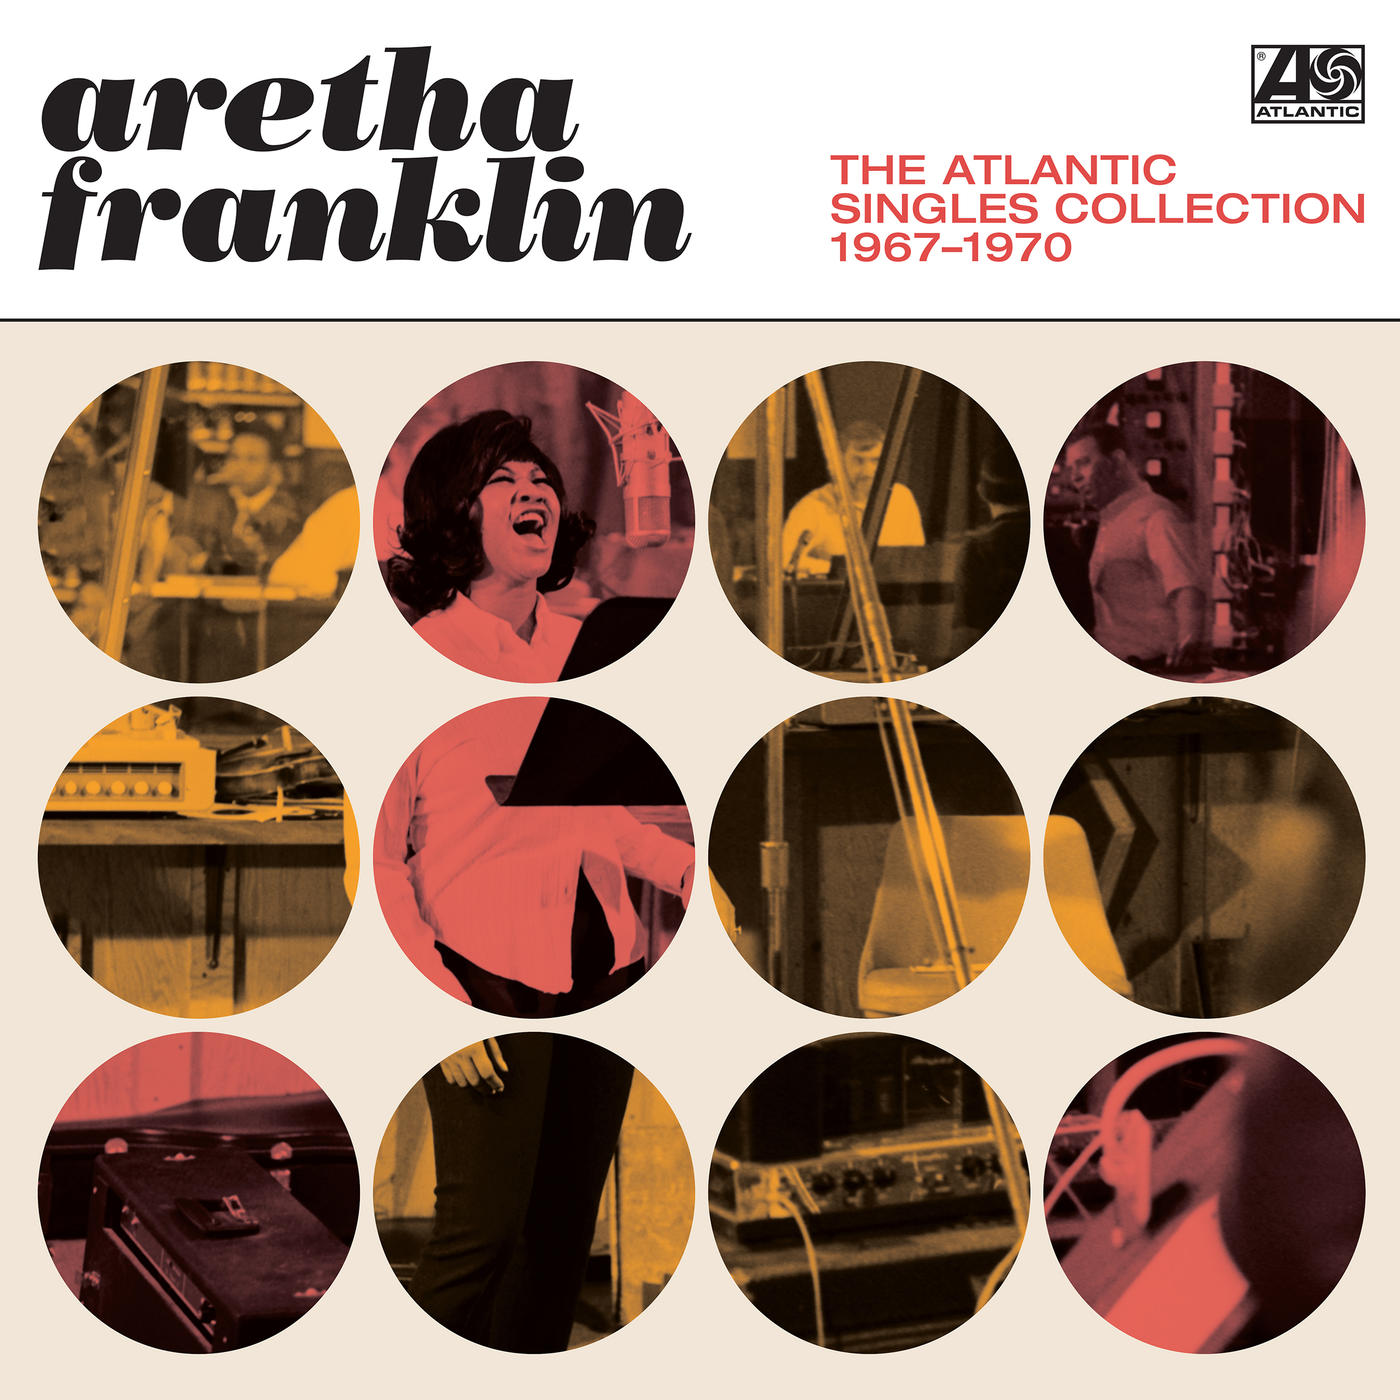 16033e66ff5 THE ATLANTIC SINGLES COLLECTION 1967-1970